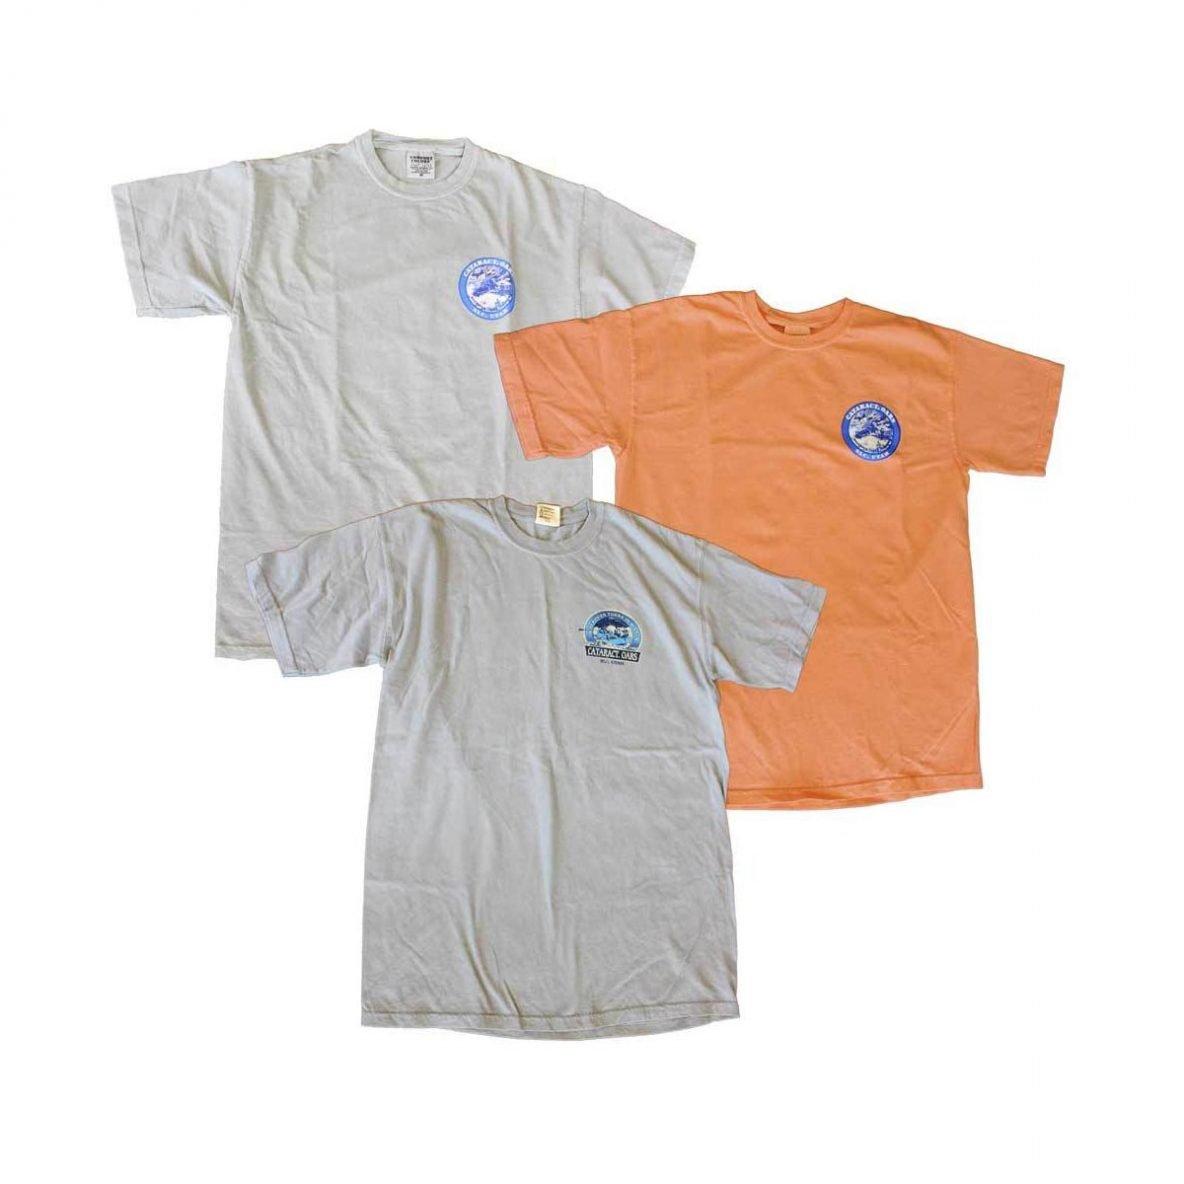 Cotton Tee Shirts